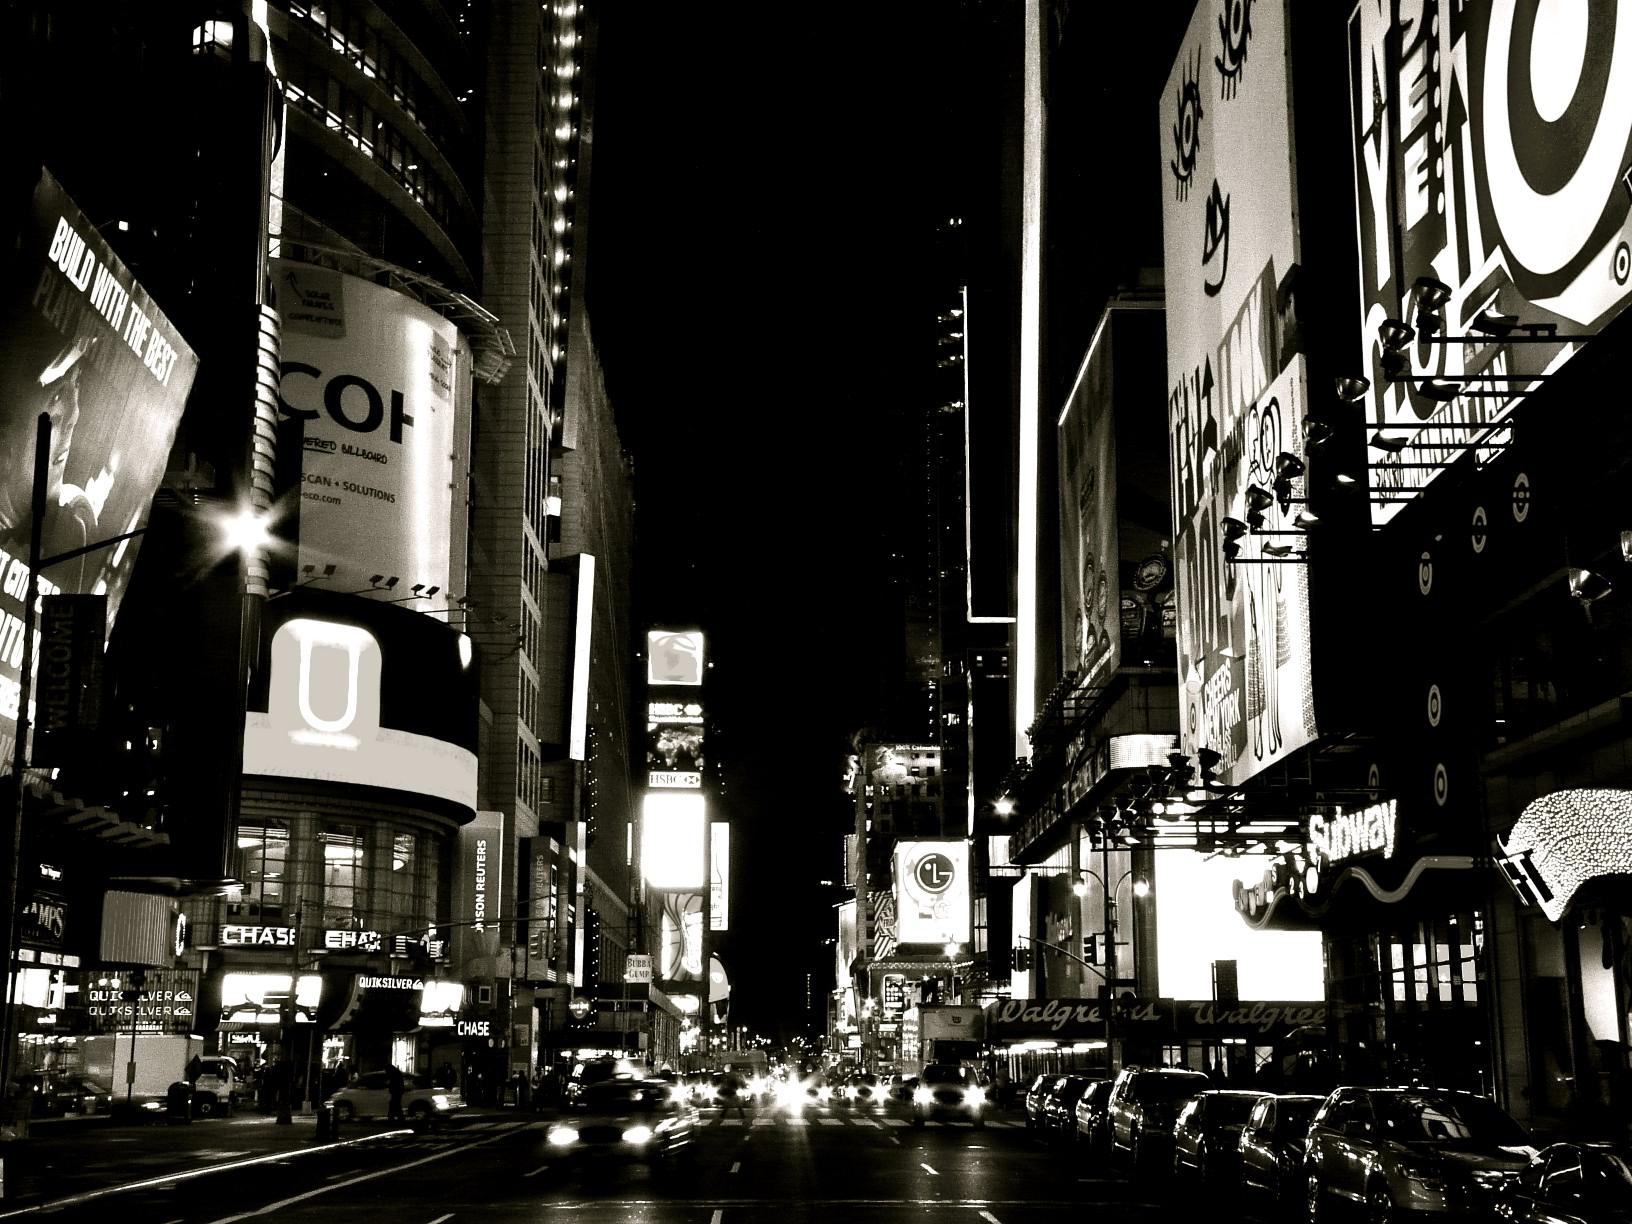 dark night on broadway